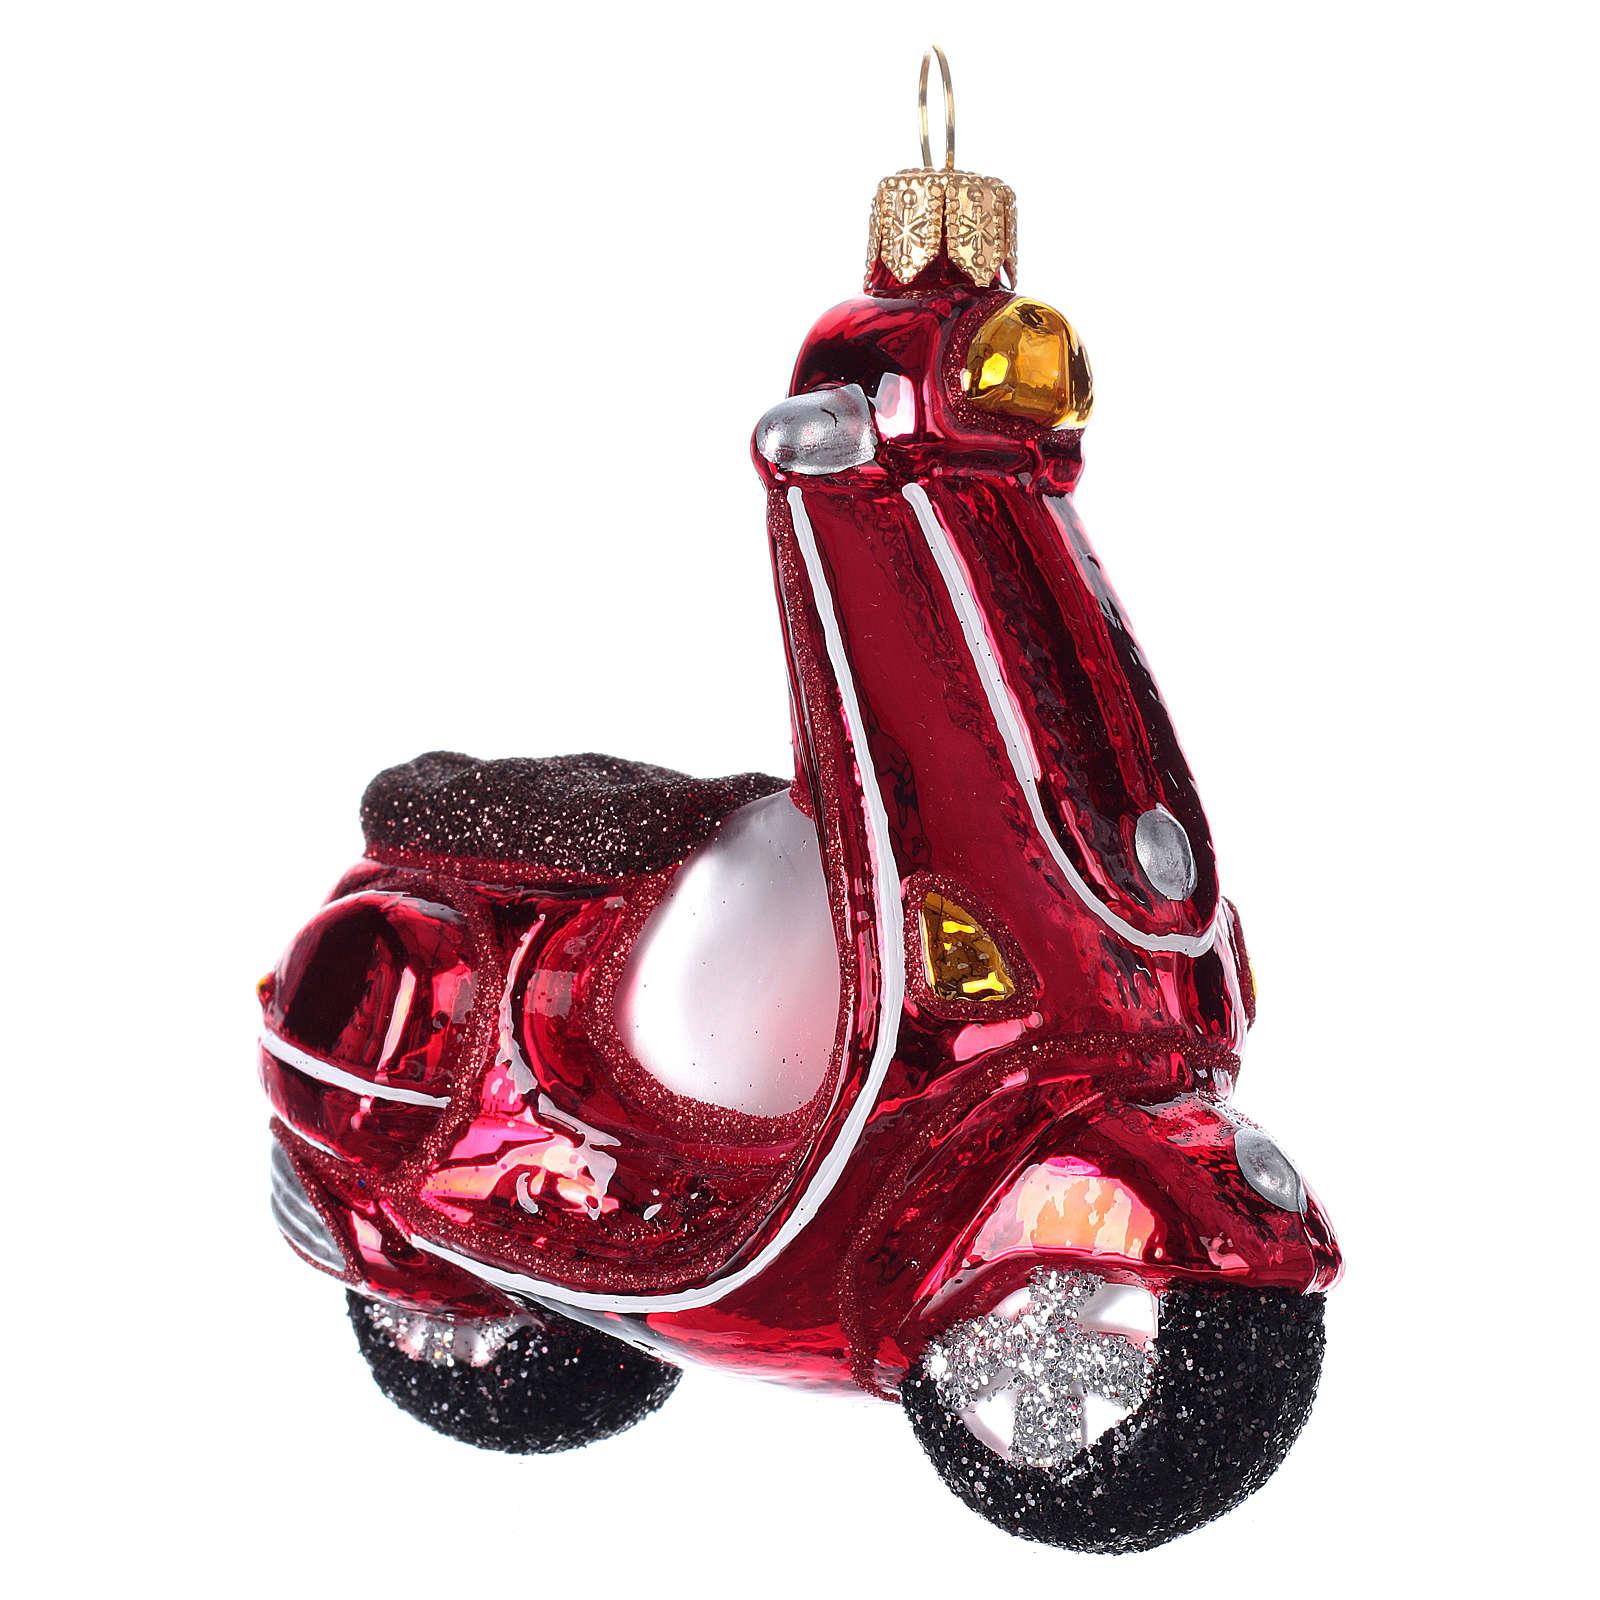 Motoneta vidro soprado adorno Árvore de Natal 4